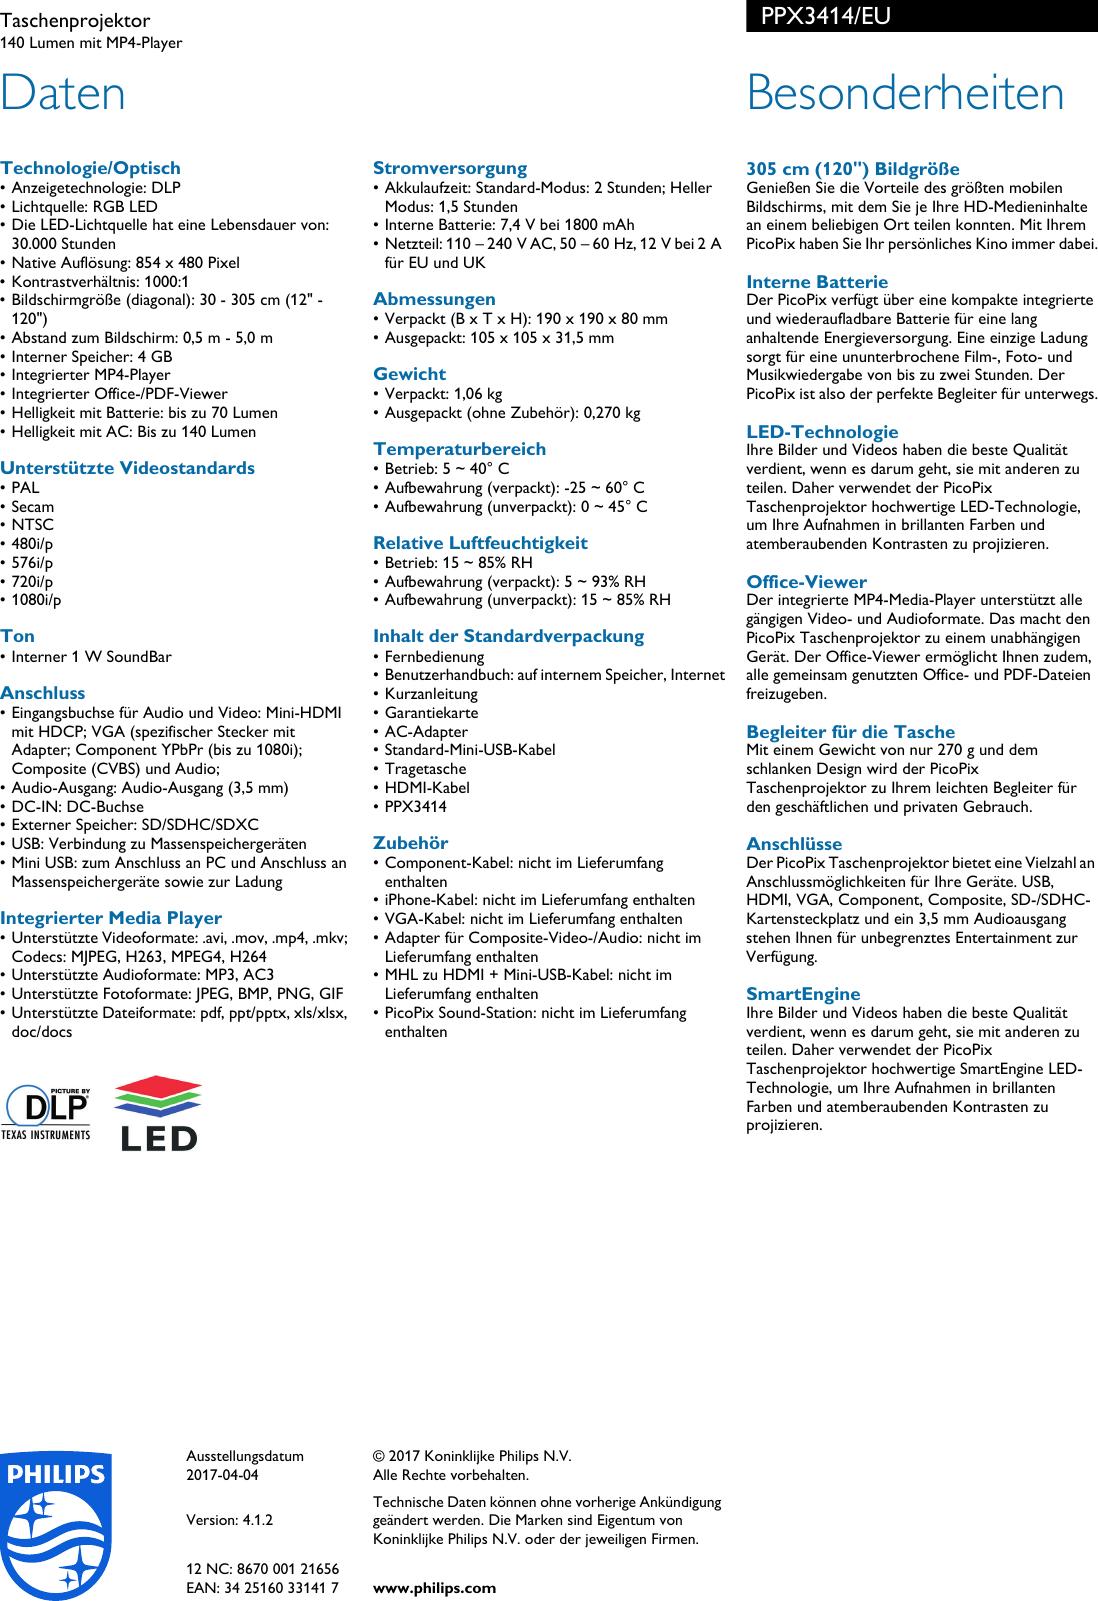 Sdxc Kartensteckplatz.Philips Ppx3414 Eu Leaflet Ppx3414 Eu Released Switzerland